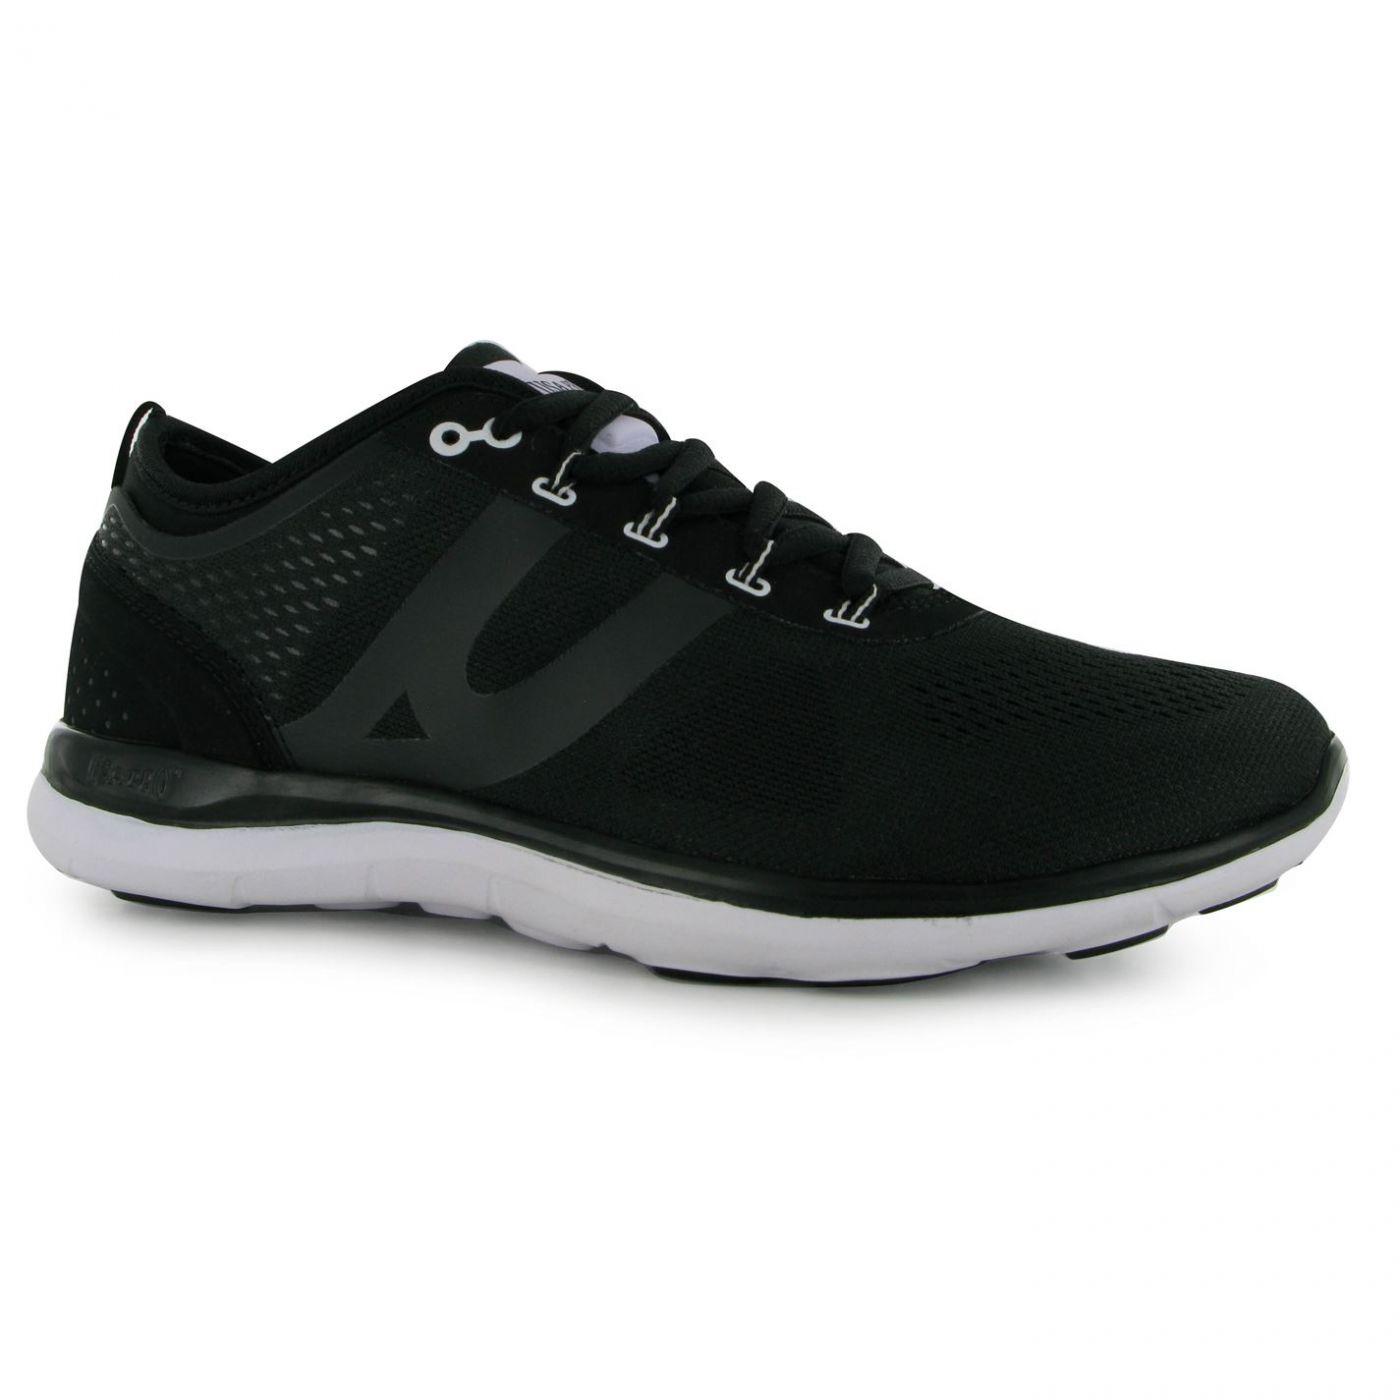 USA Pro Quartz Ladies Training Shoes